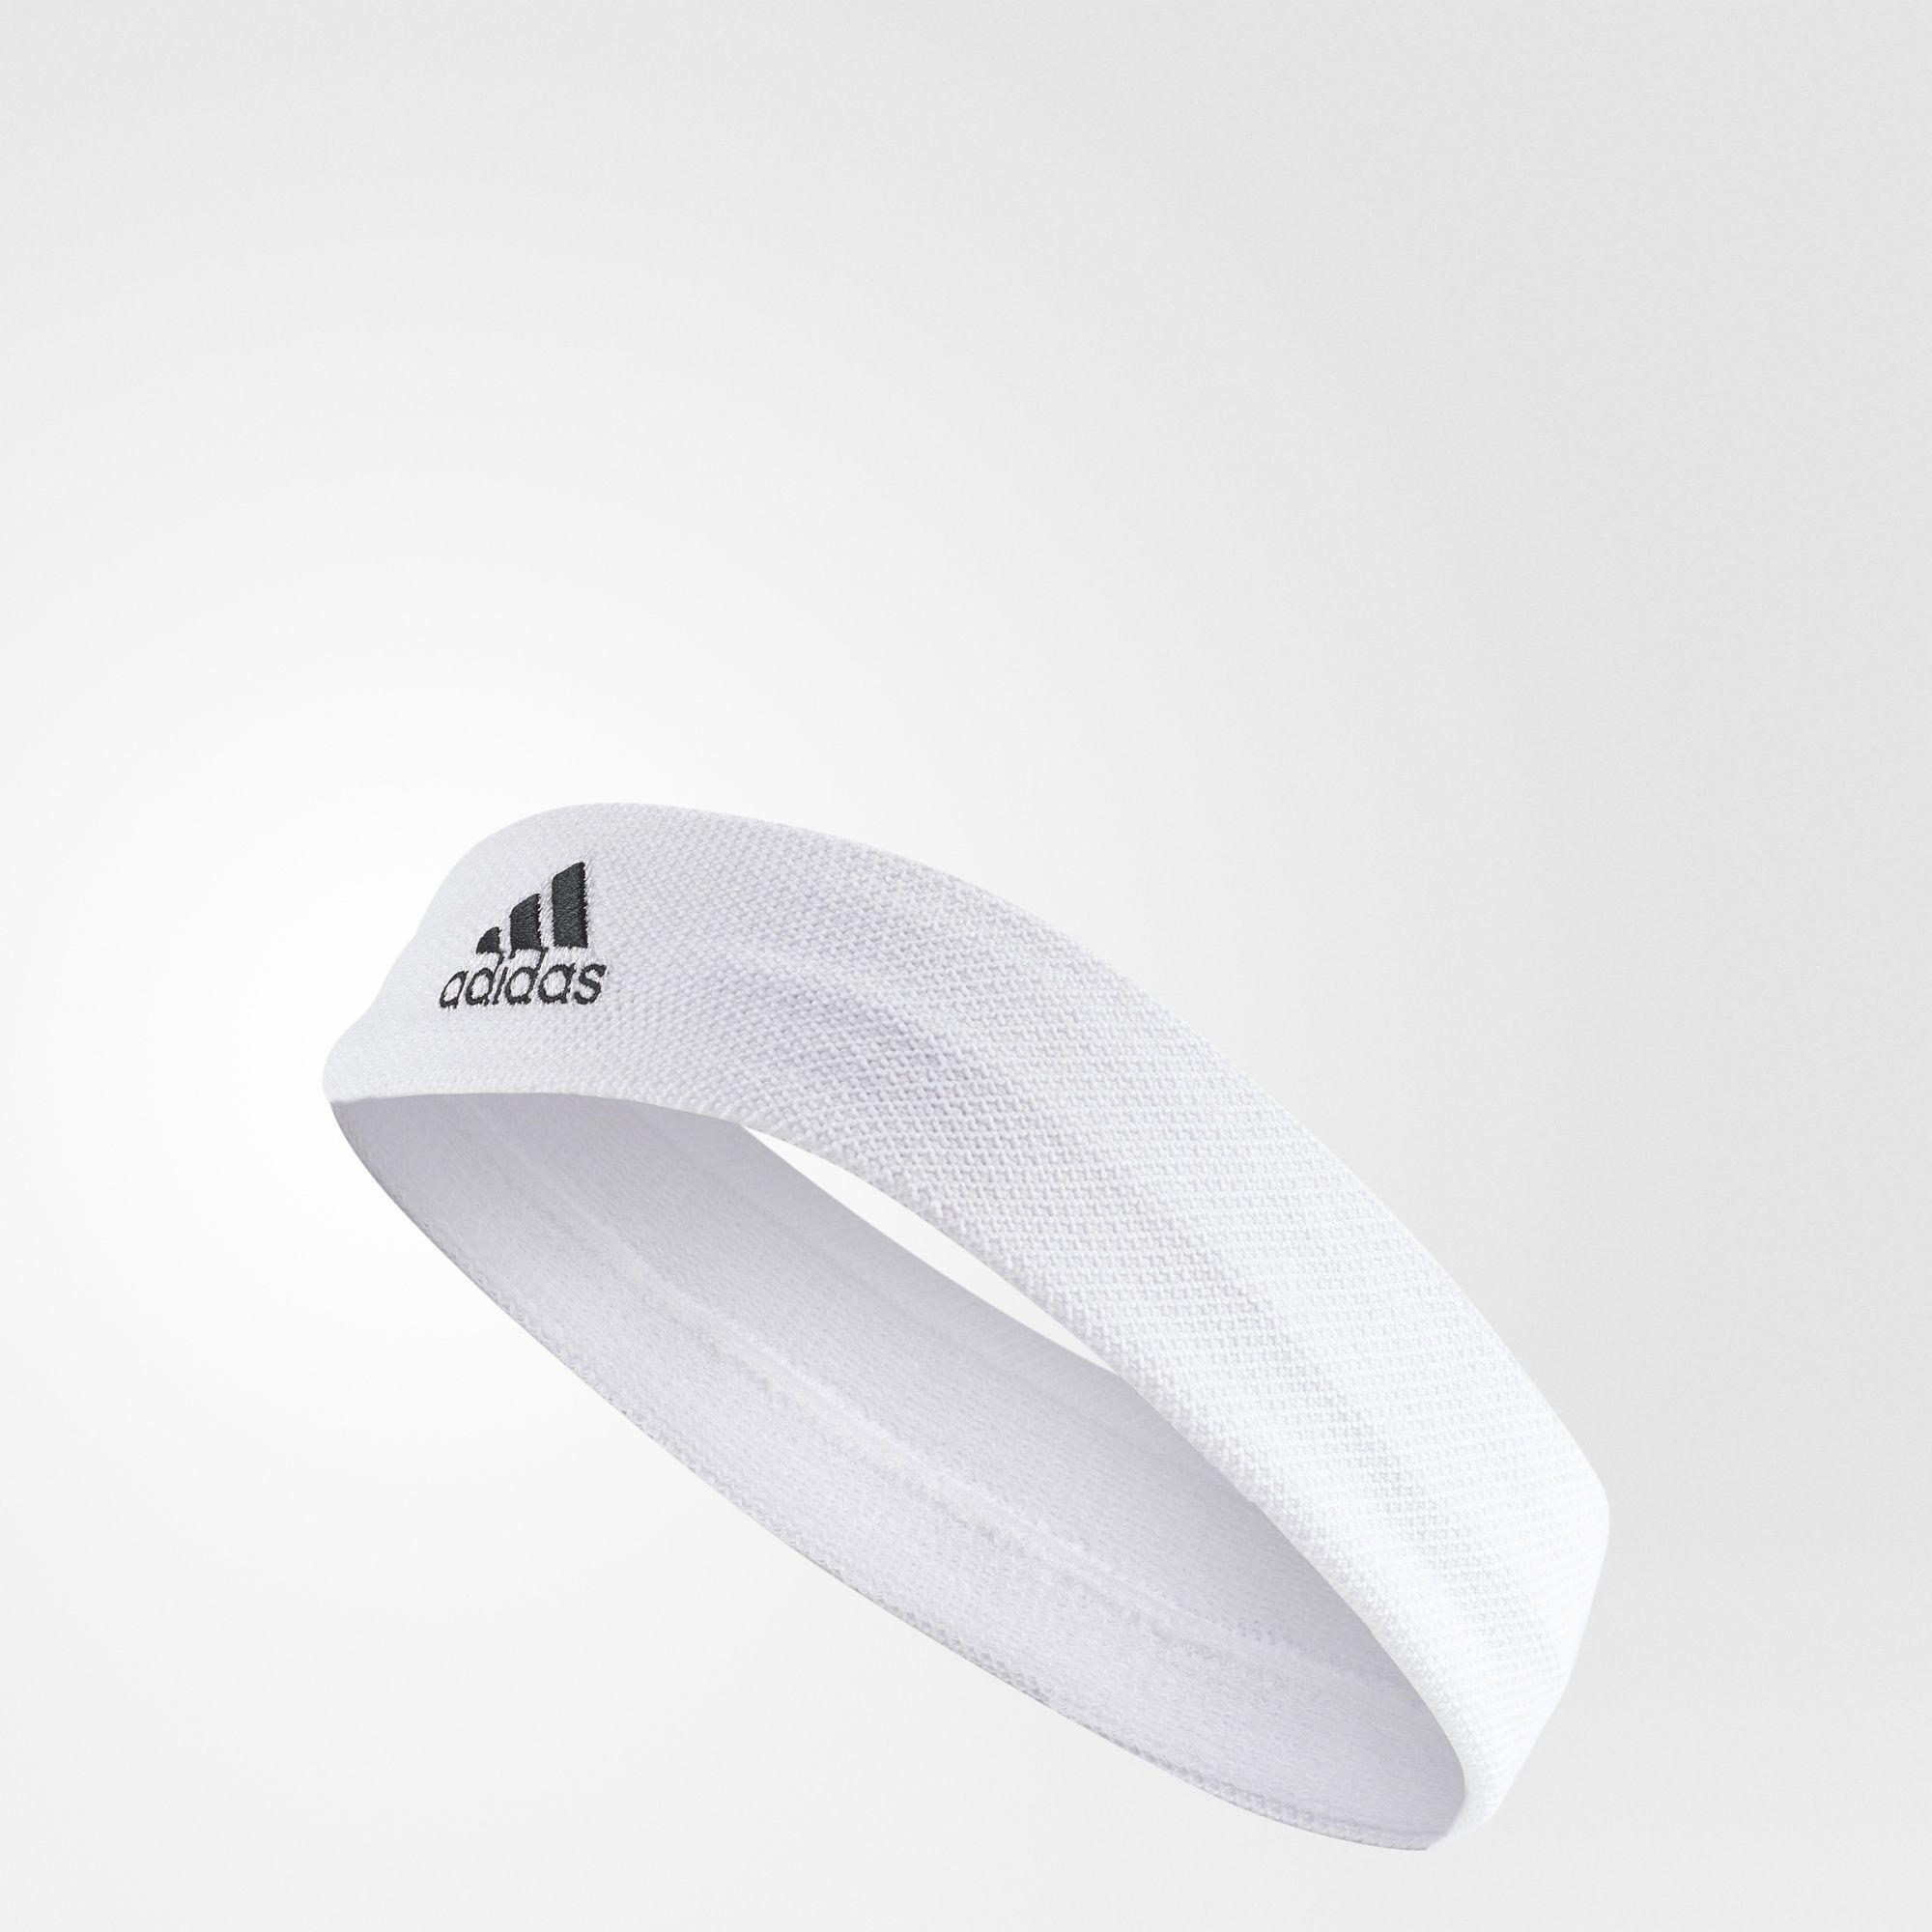 ADIDAS TEN HEADBAND 頭帶 網球 白 黑【運動世界】S97911